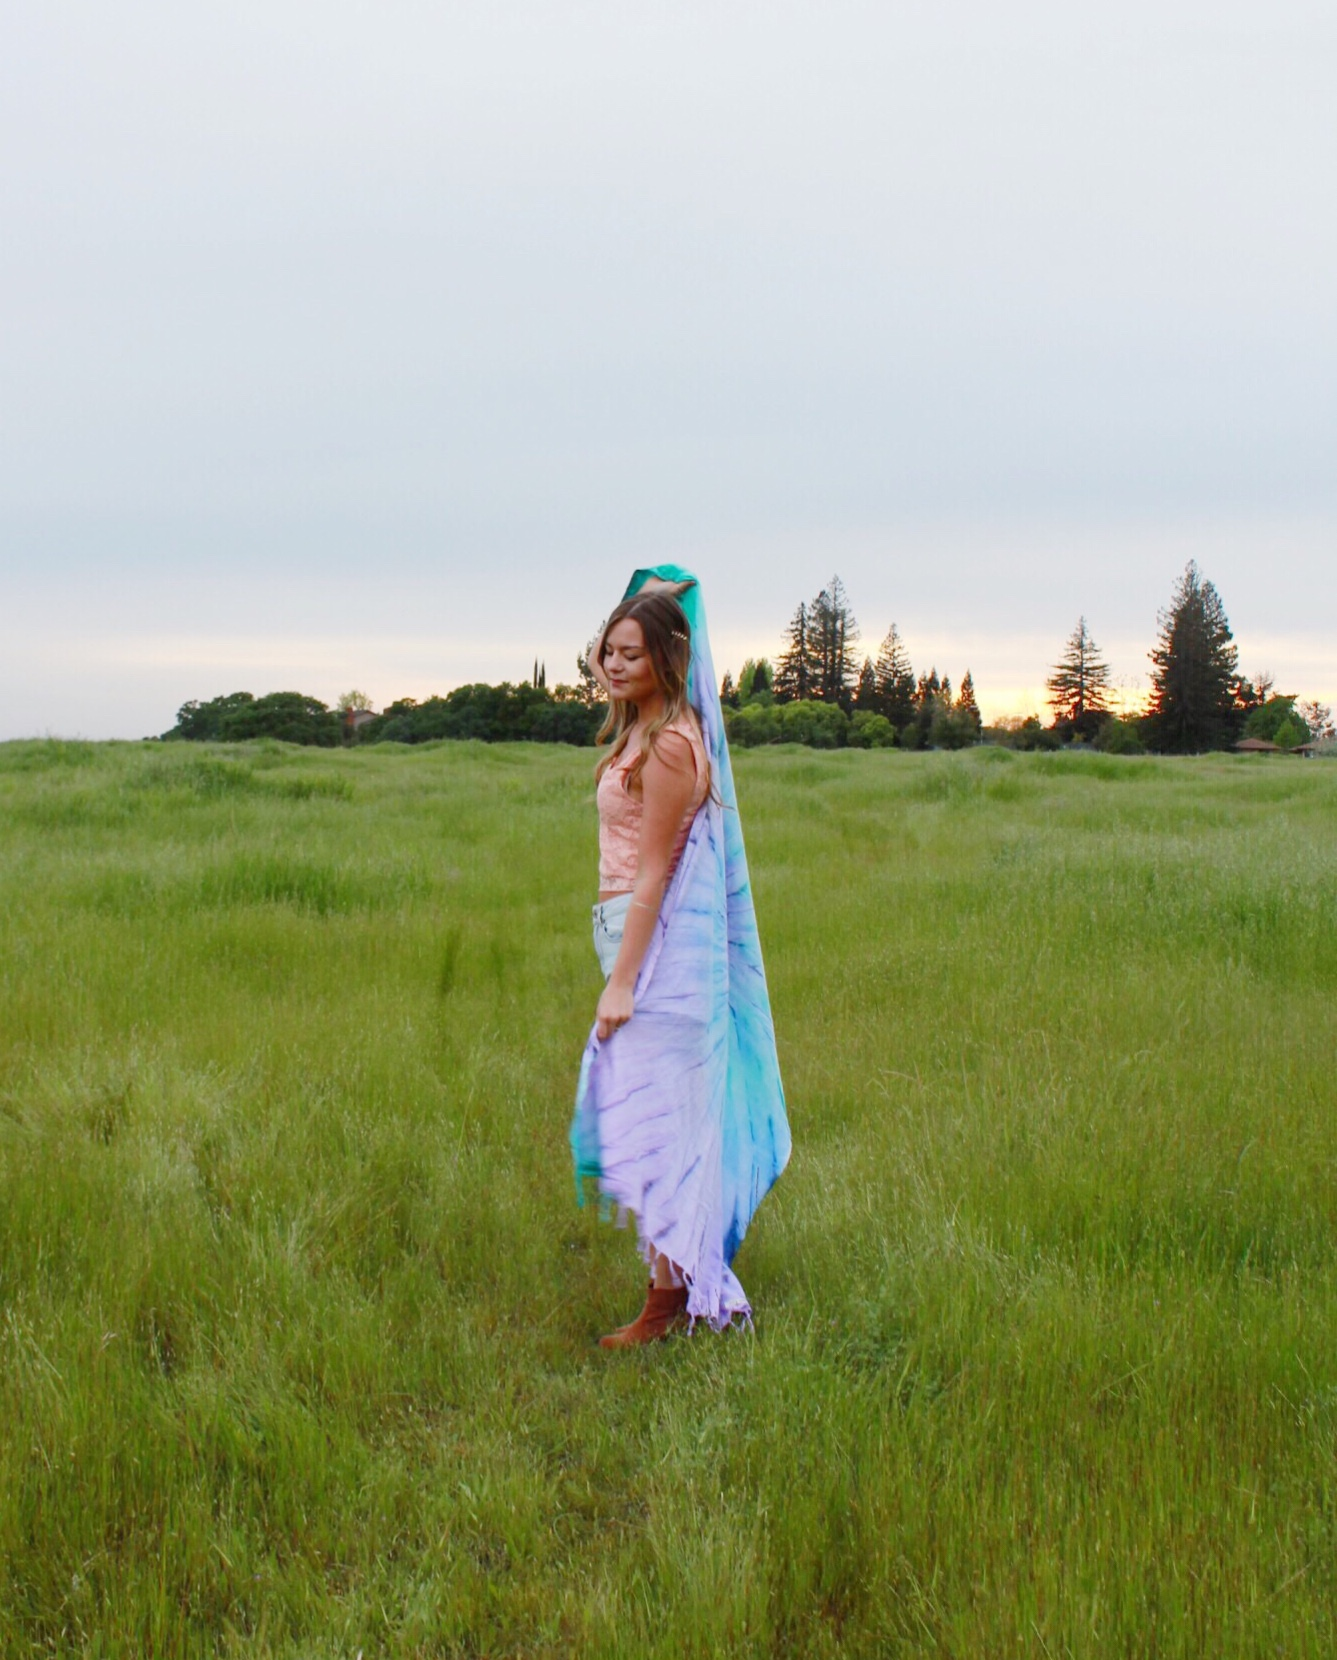 Festival Fashion and Tie Dye SandCloud Towel